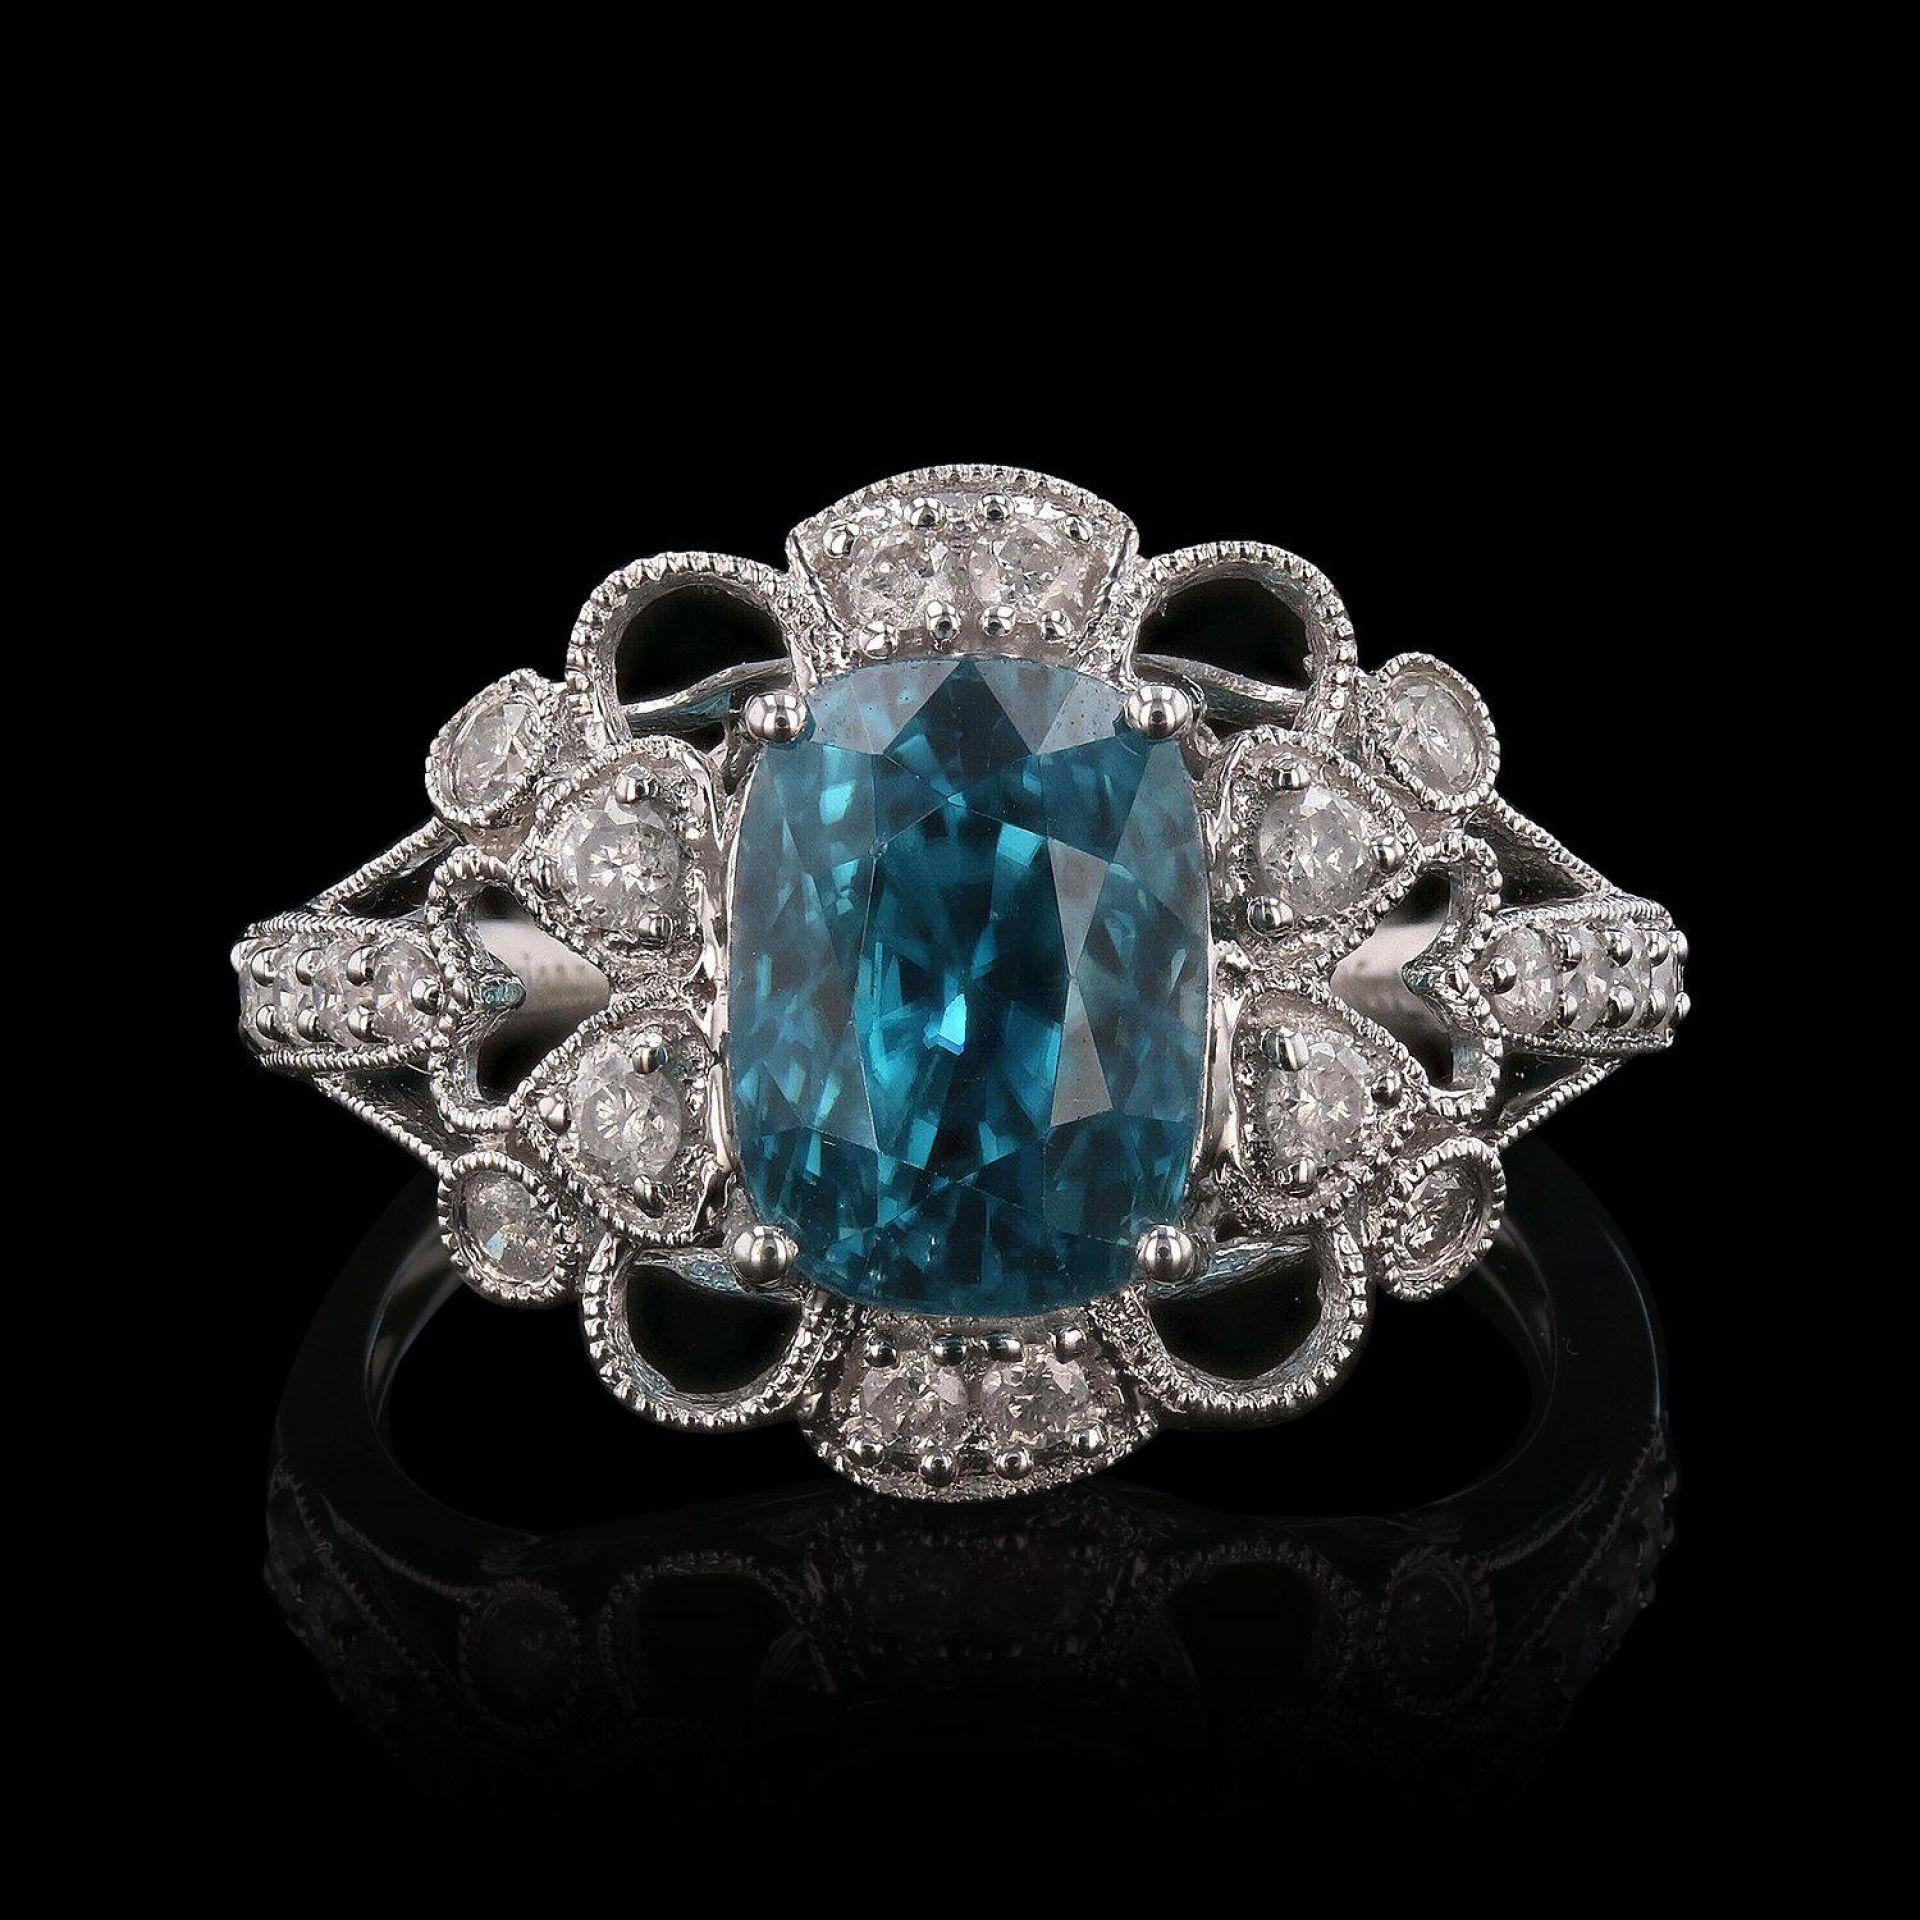 4.93ct Zircon and 0.35ctw Diamond 14K White Gold Ring